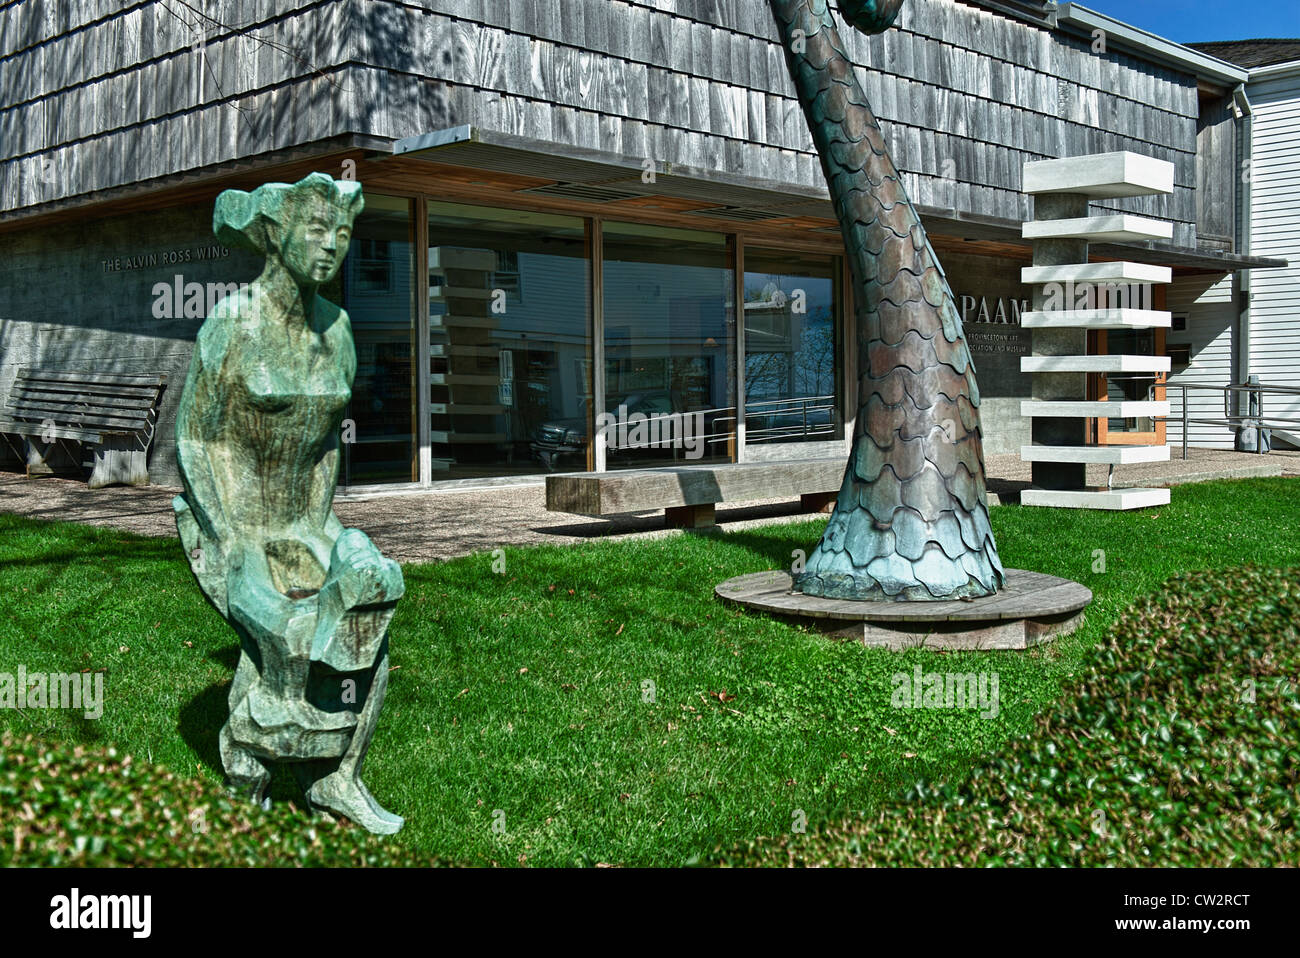 Provincetown Art Association and Museum, Cape Cod, Massachusetts, USA - Stock Image